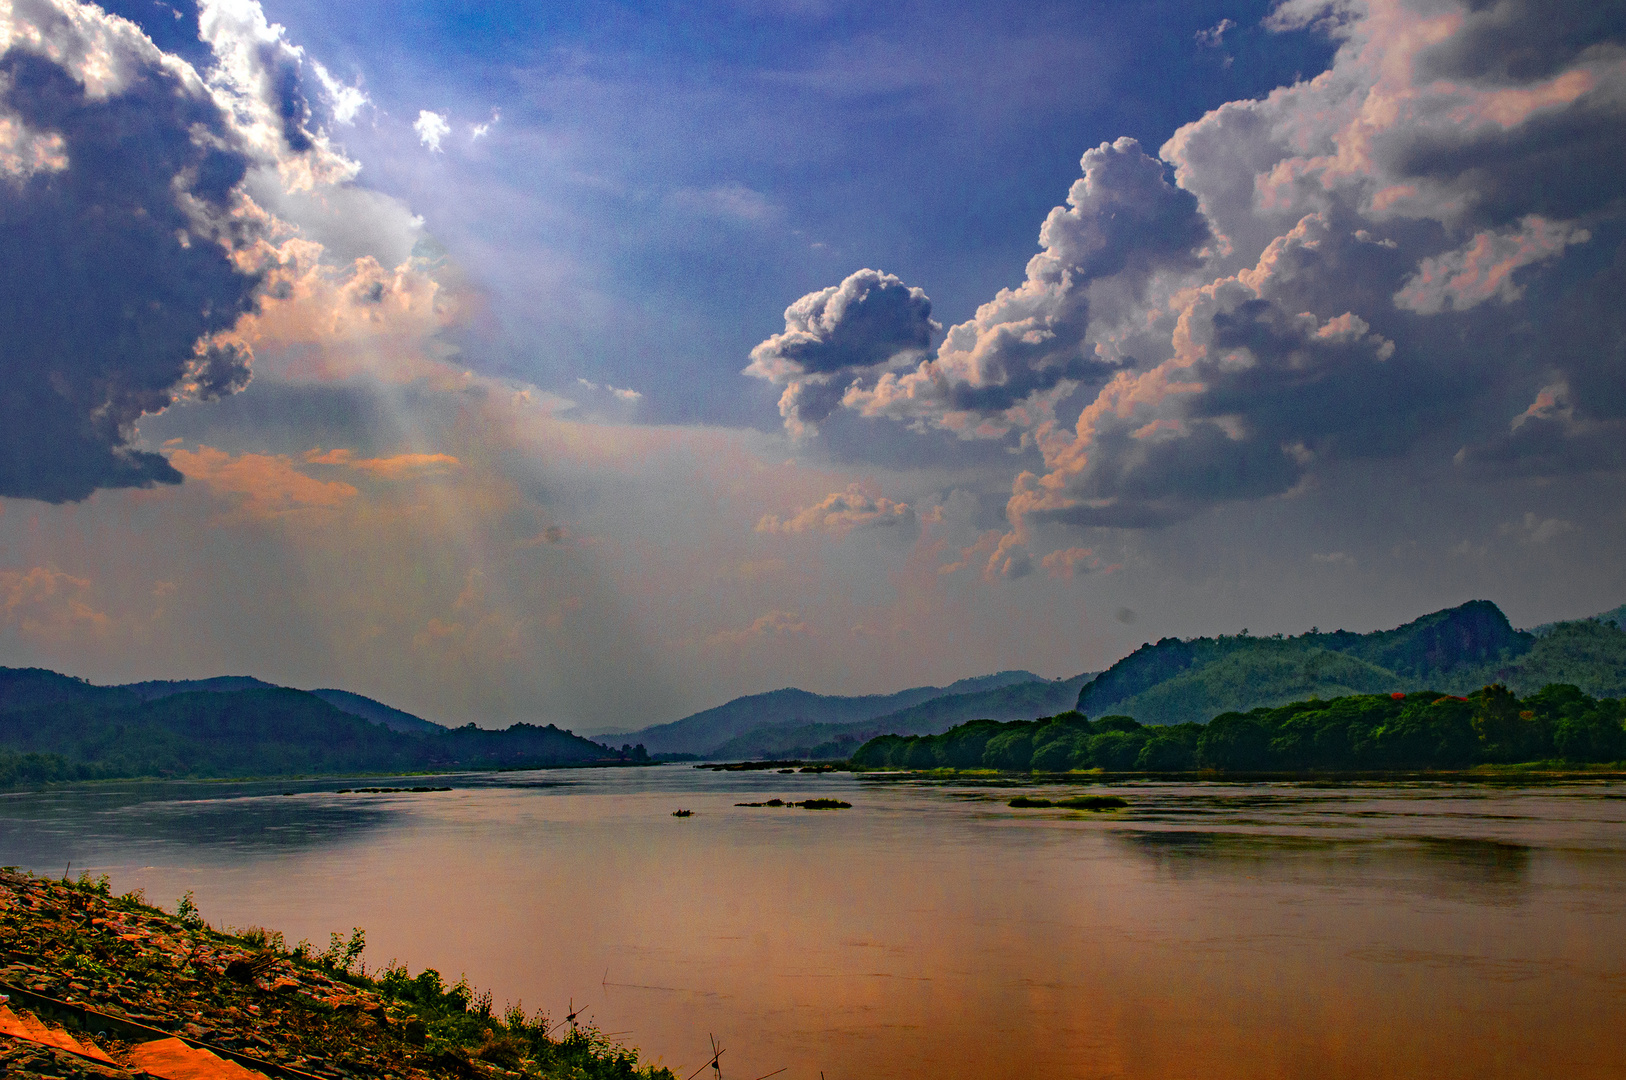 Sunset walk along the river bank